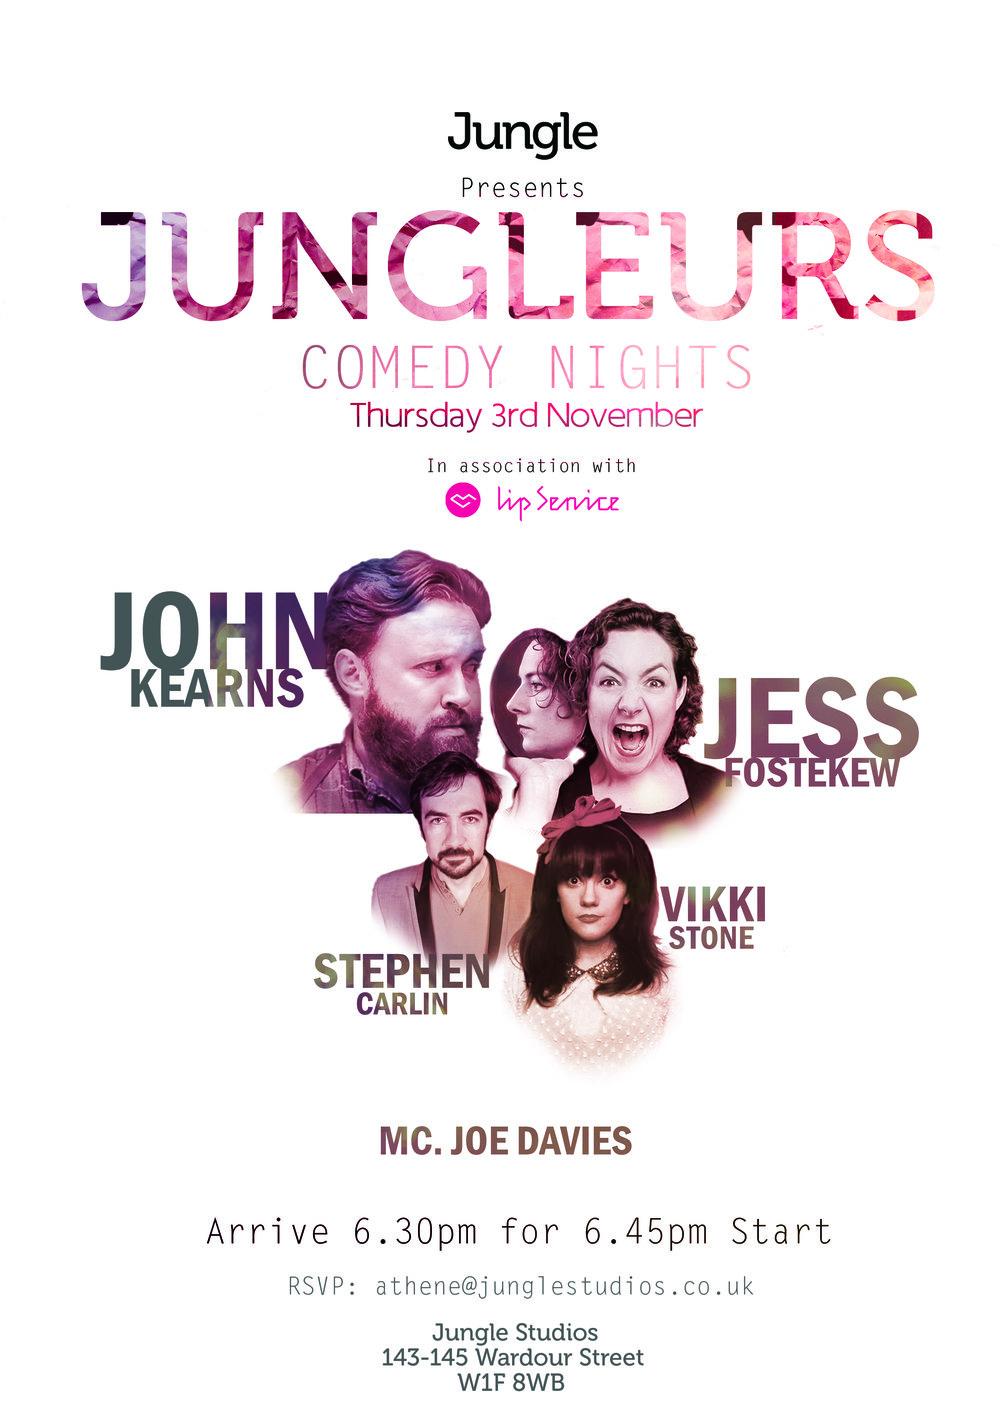 Jungleurs_Jungle Comedy Nights_3rdNovember.jpg